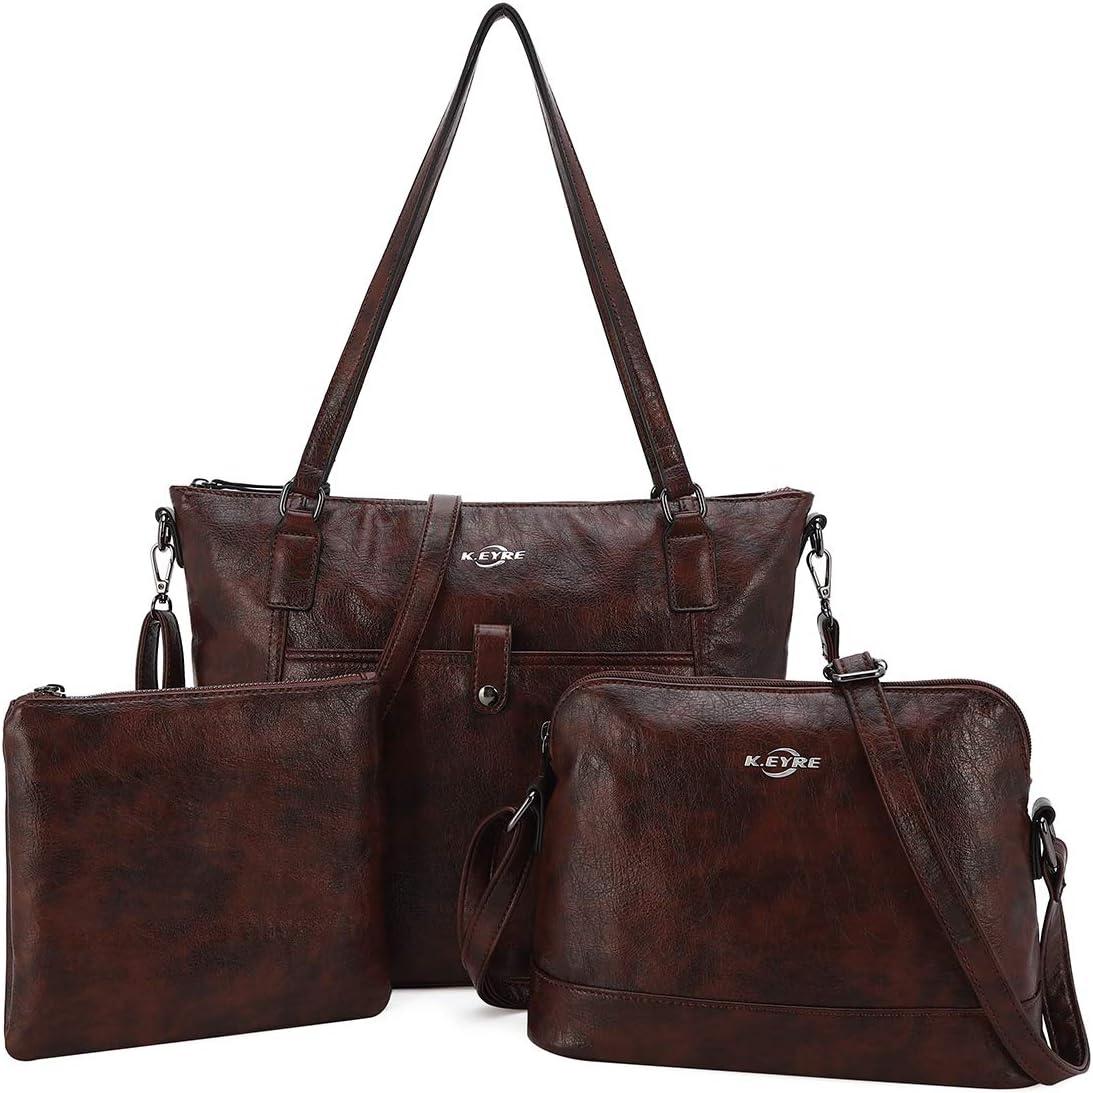 Women Shoulder Handbag Purse Top-Handle Hobo Roomy Casua Ladies' Shoulder Bag Fashion PU Tote Satchel Bag for Women (1A-KL2226#687#10COFFEE)